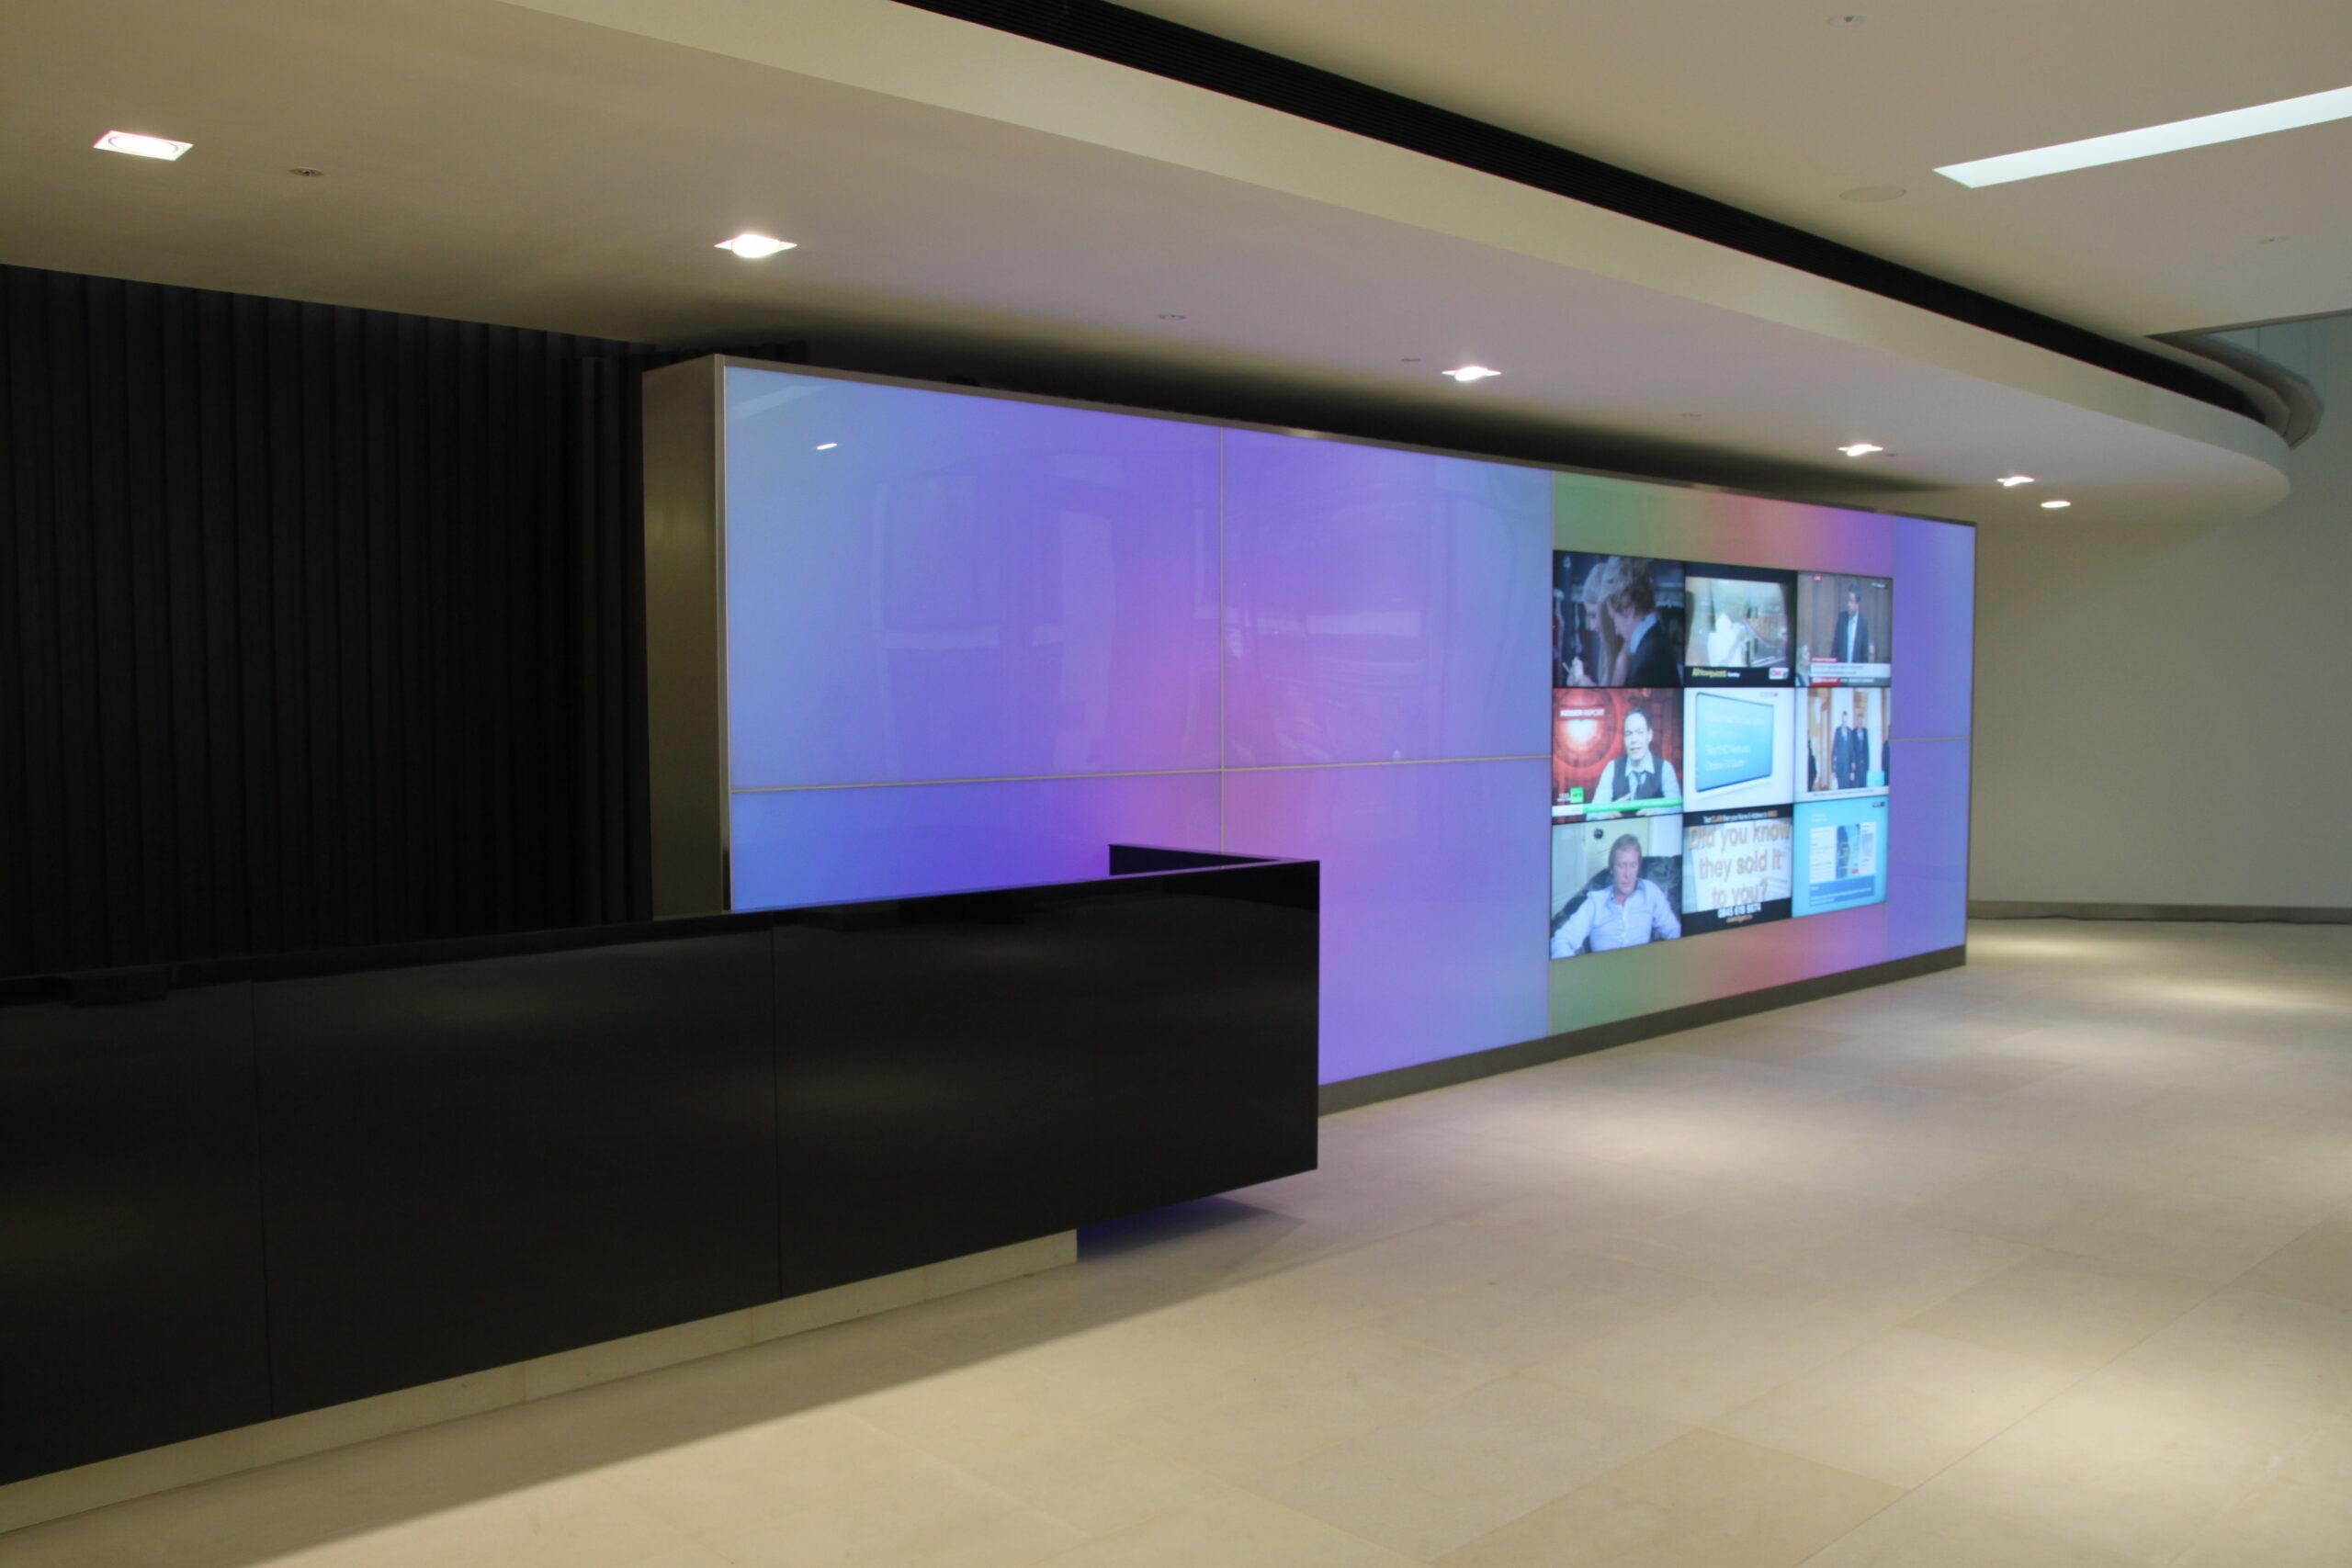 110 Fetter Lane Videowall - Exterior and Interior Lighting for Buildings